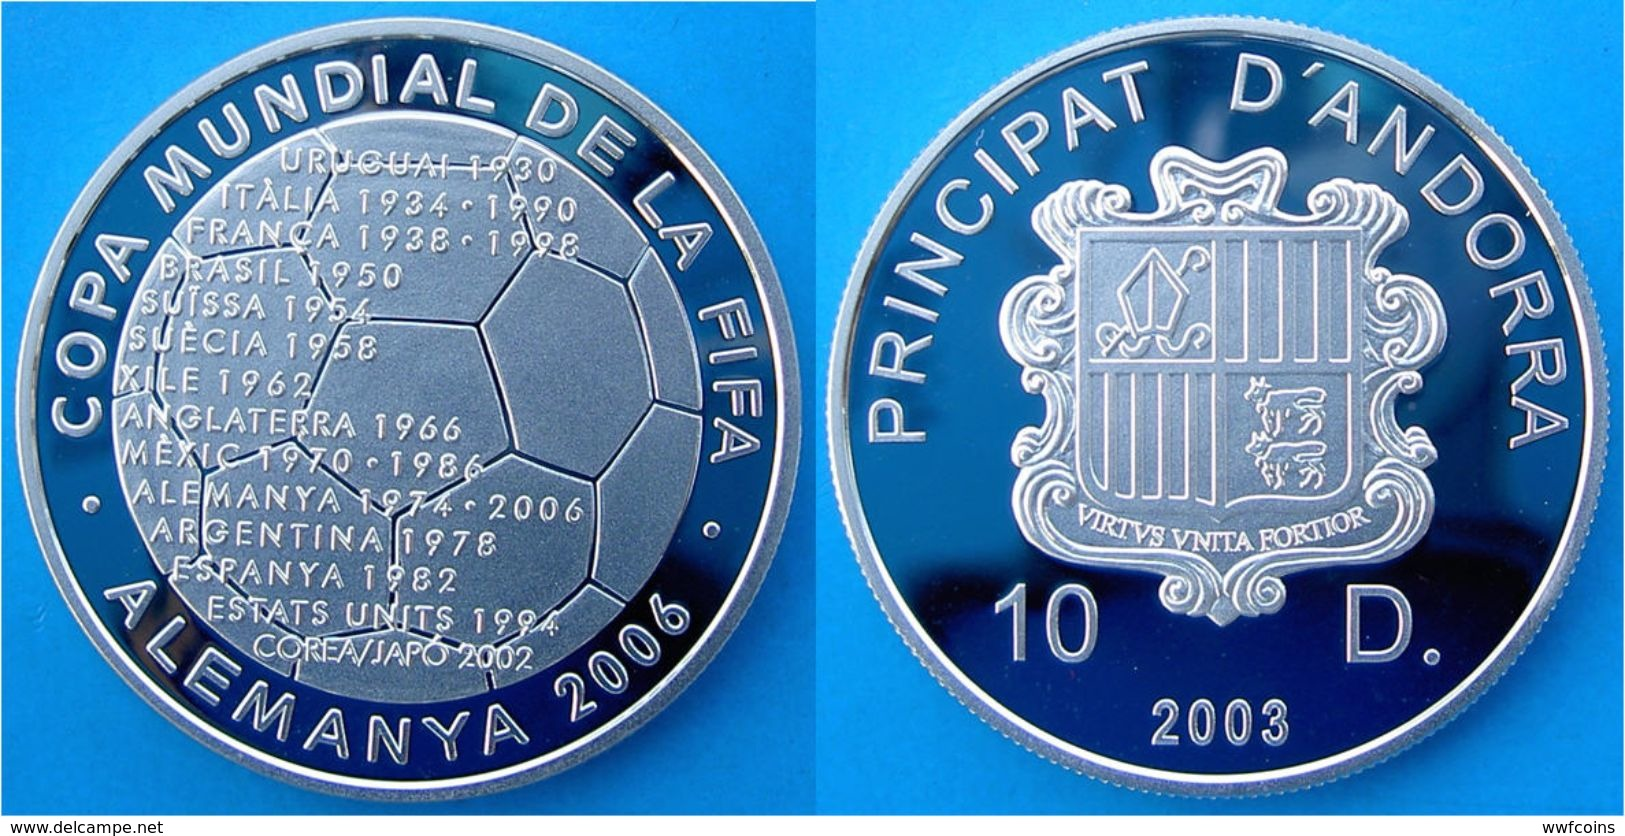 ANDORRA 10 D 2003 ARGENTO PROOF SILVER GERMANY FOOTBALL WORLD CHAMPIONSHIP FOOTBALL PESO 31,4g TITOLO 0,925 CONSERVAZION - Andorra